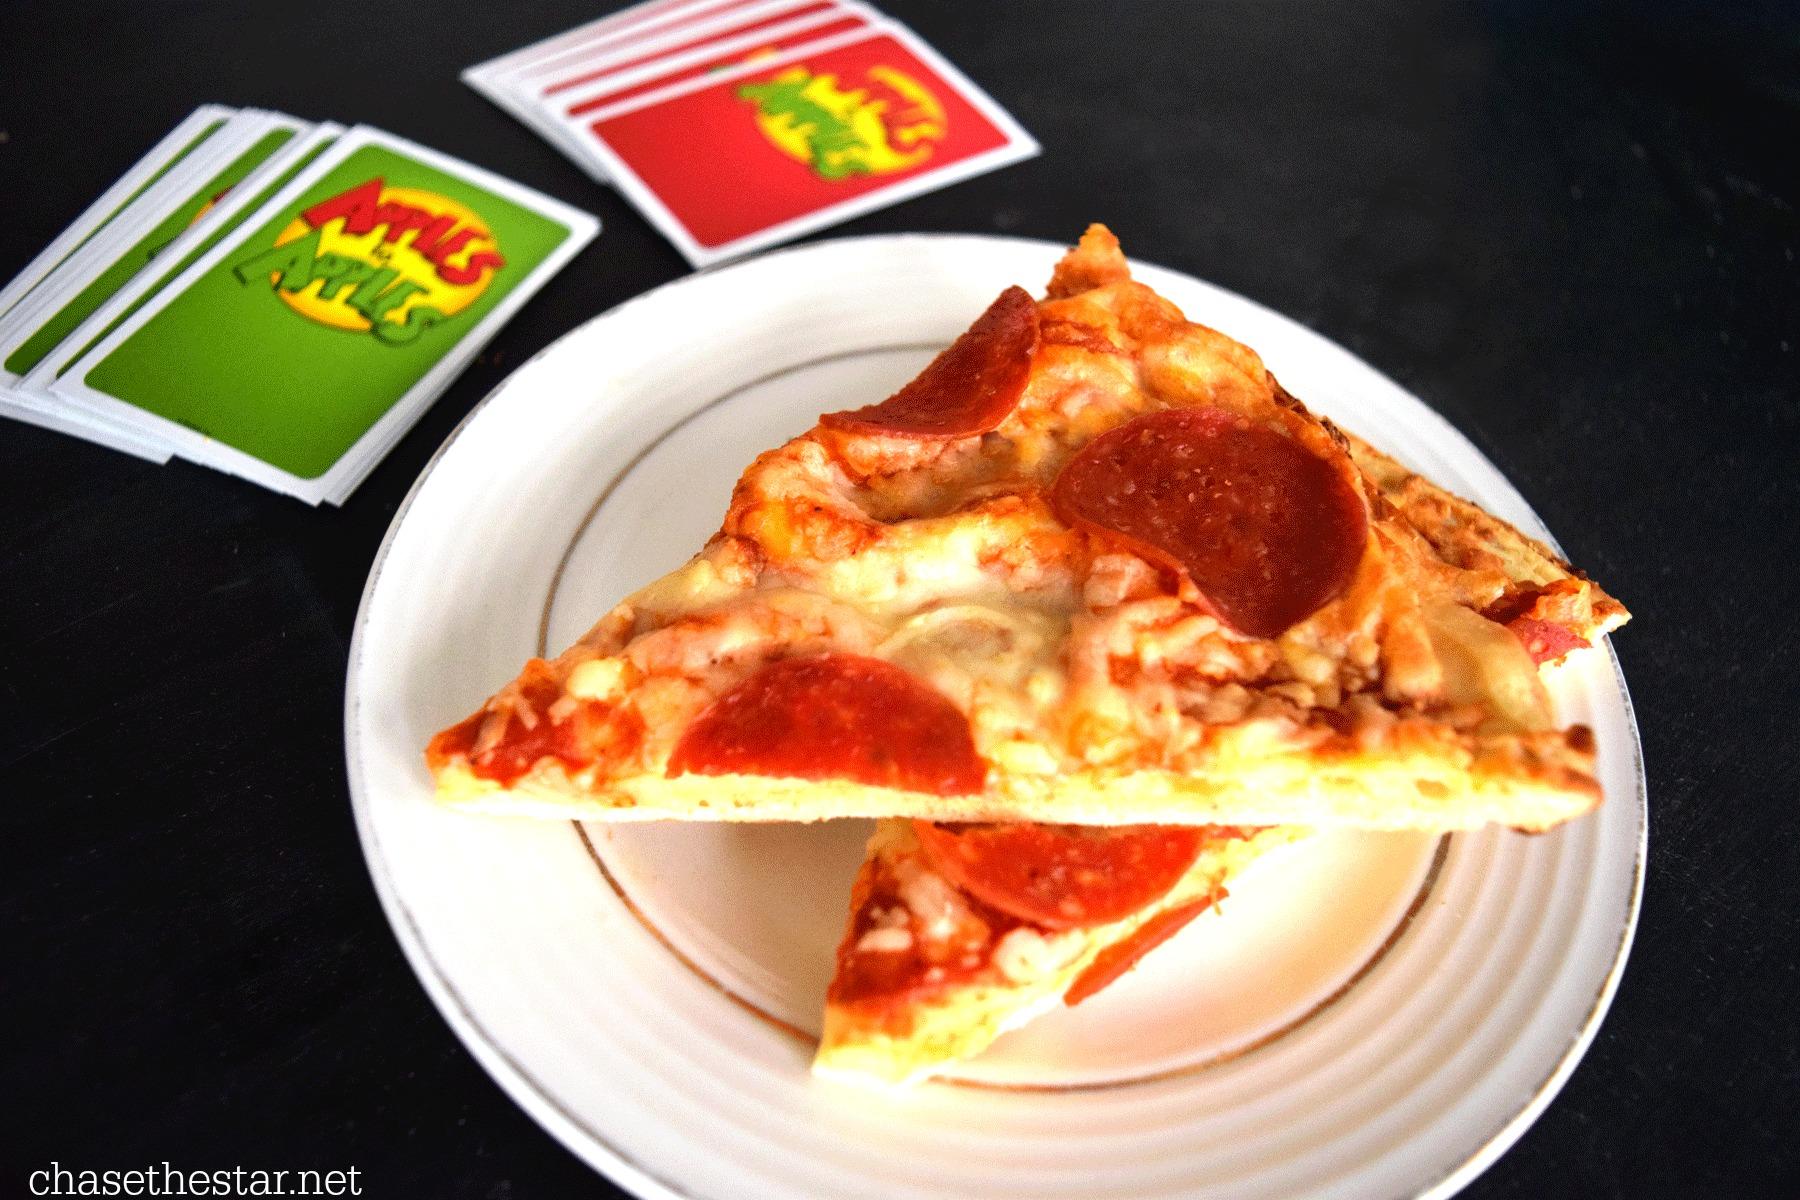 Game Night Pizza #BigPizzeriaTaste #Pmedia  #ad